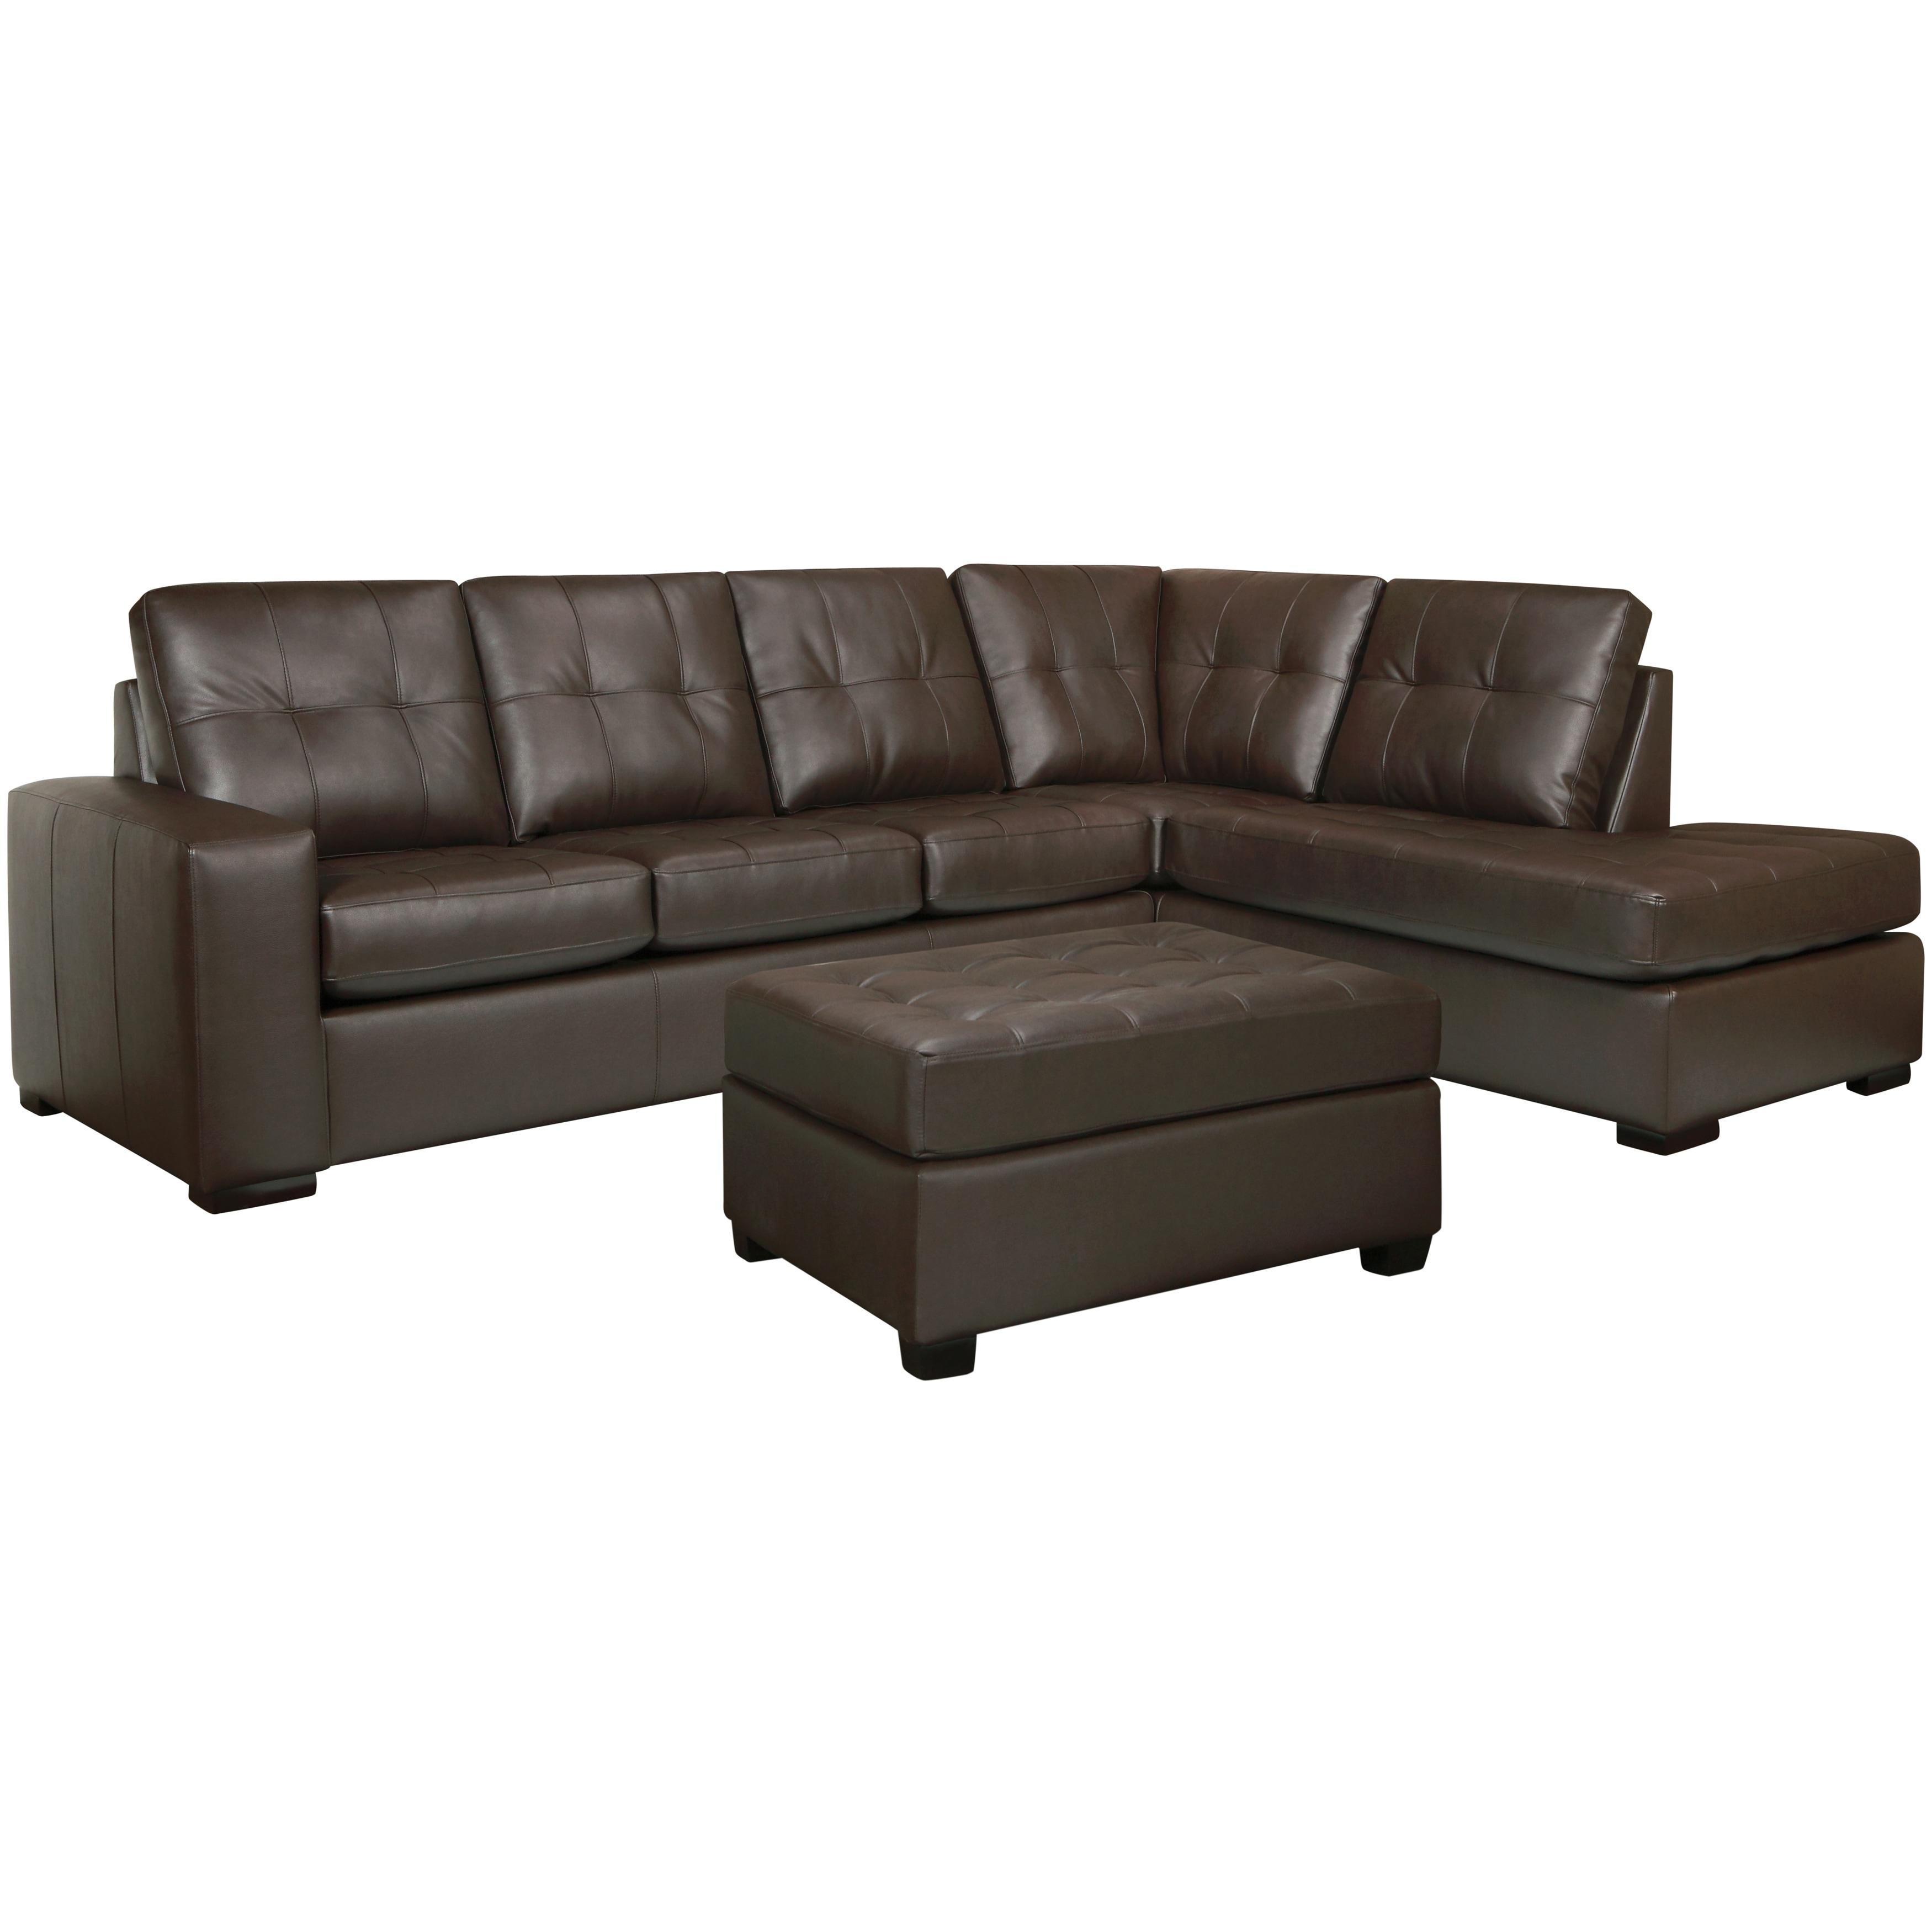 Drake Chocolate Brown Italian Leather Sectional Sofa and ...